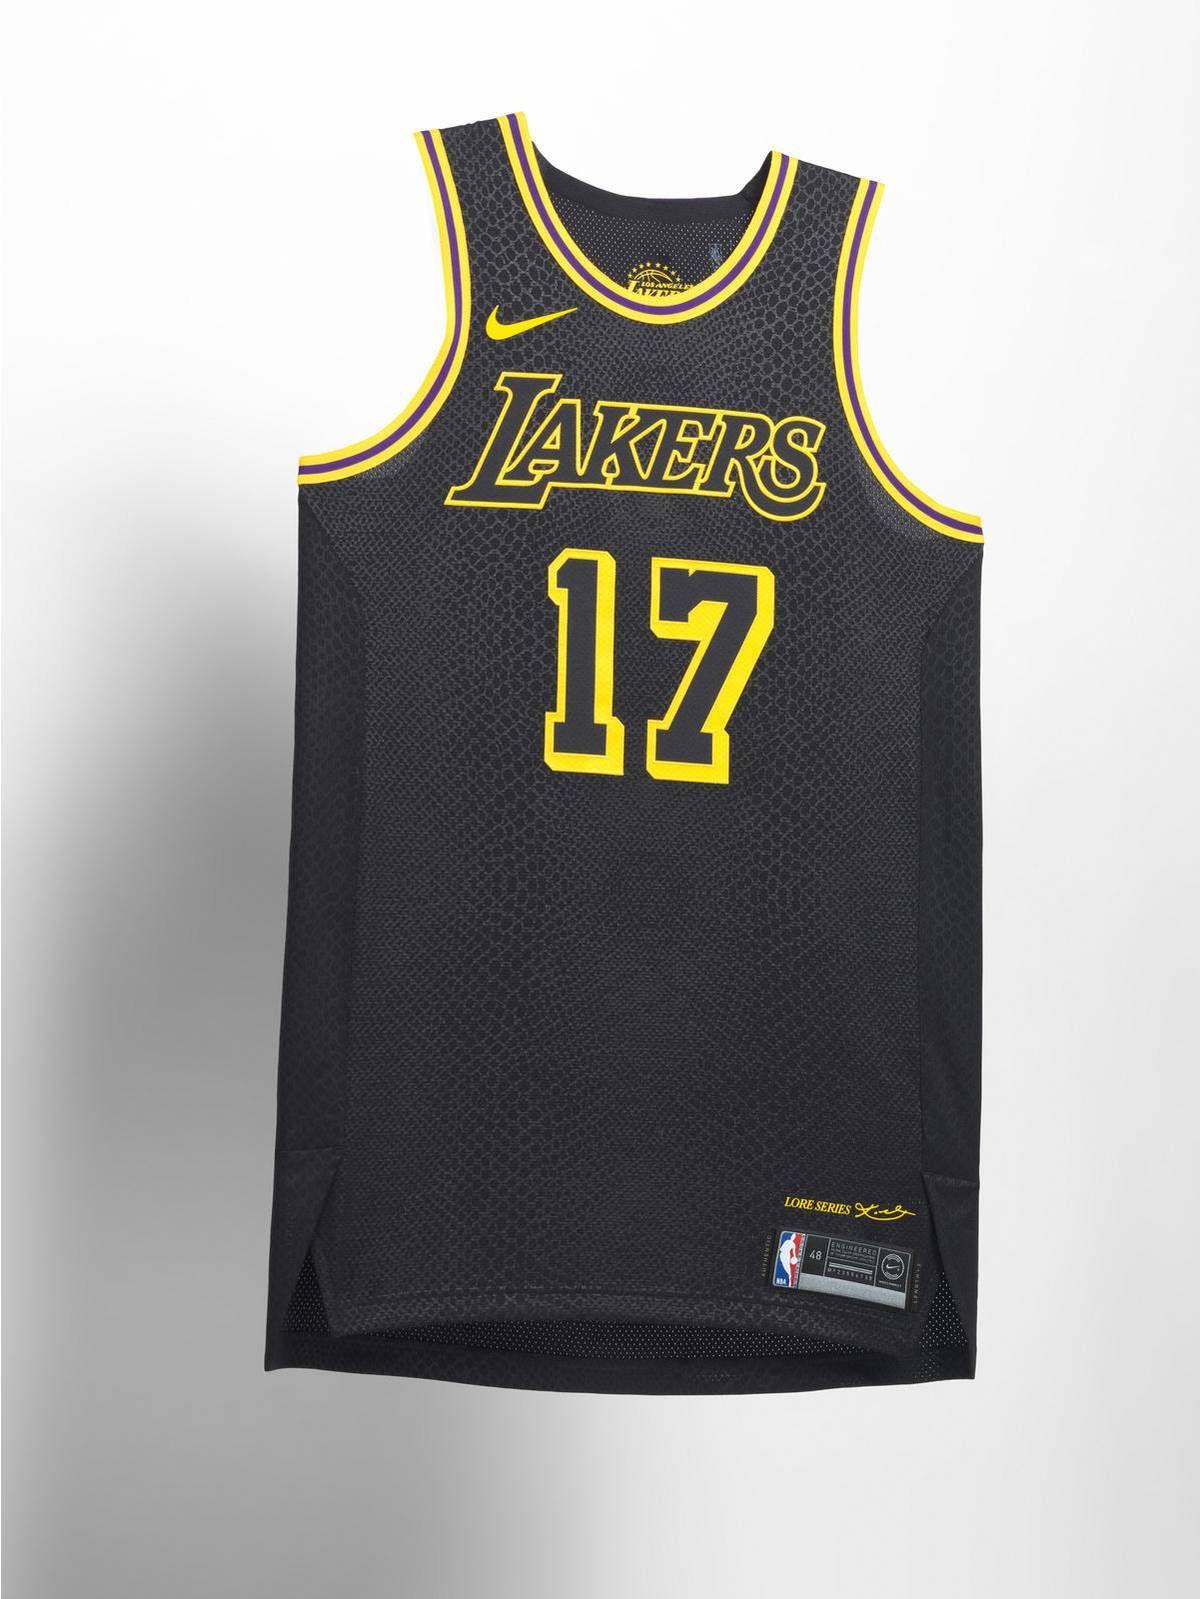 f07f2dc558 Look  Nike City Edition jerseys revealed